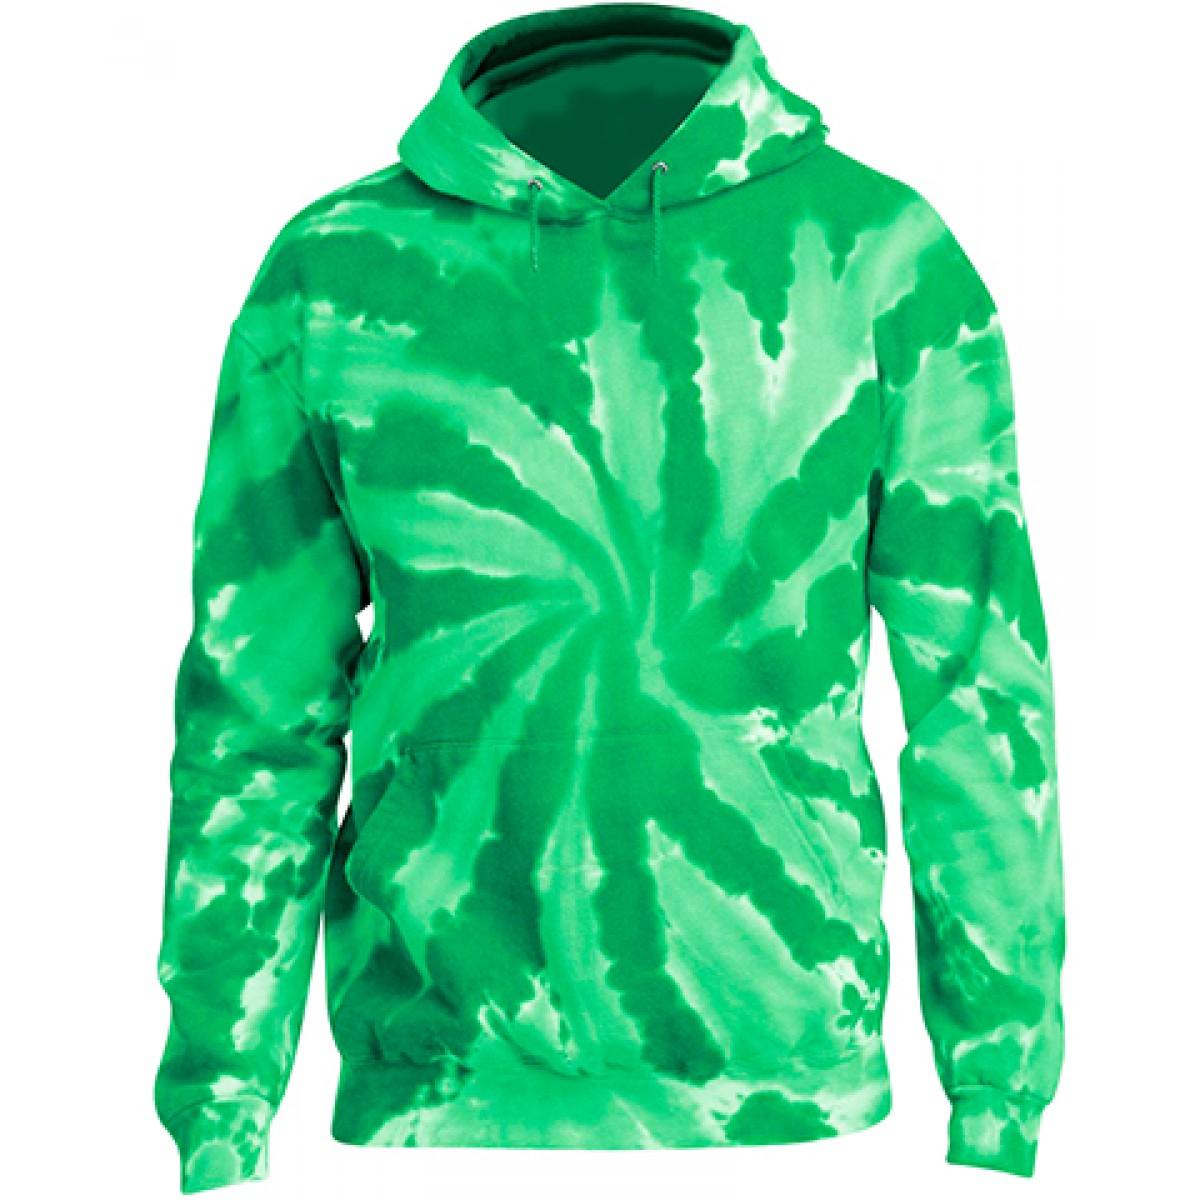 Tie-Dye Pullover Hooded Sweatshirt-Green-S